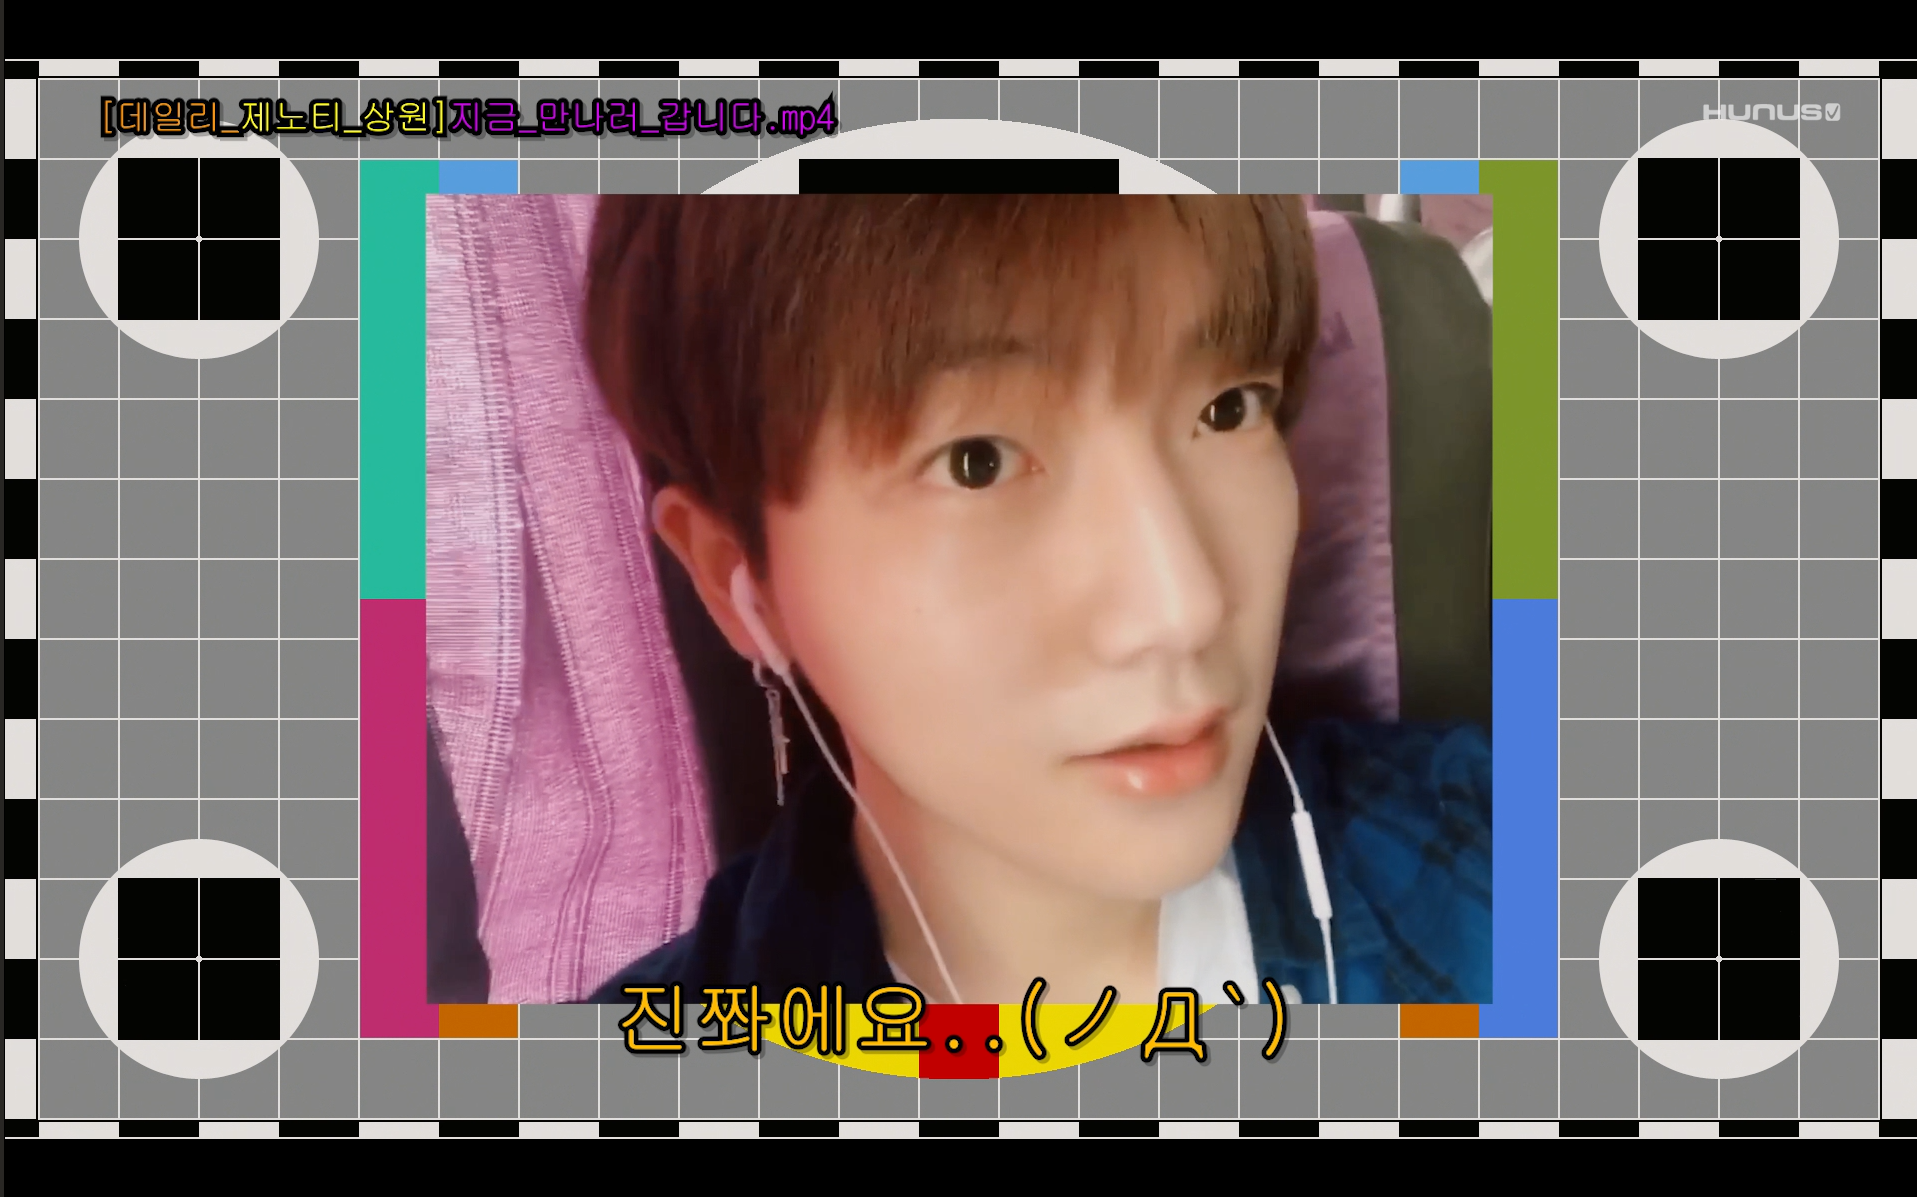 [XENO-T] Daily XENO-T (상원편)